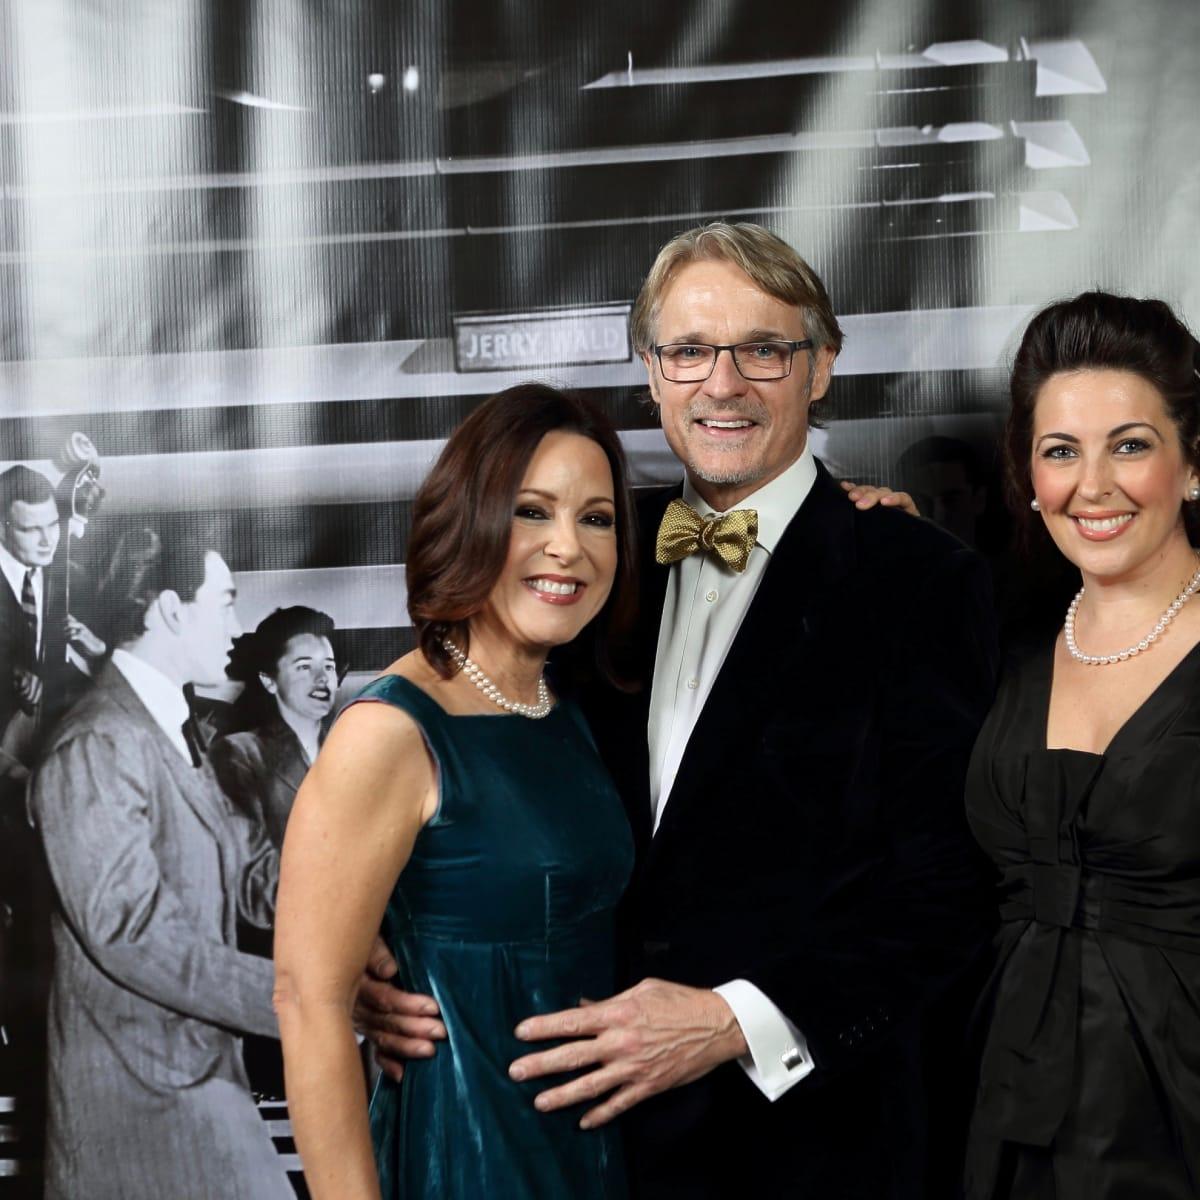 Jodie Eisenhardt, Tim Collins, Sarah Bray at Stages Gala